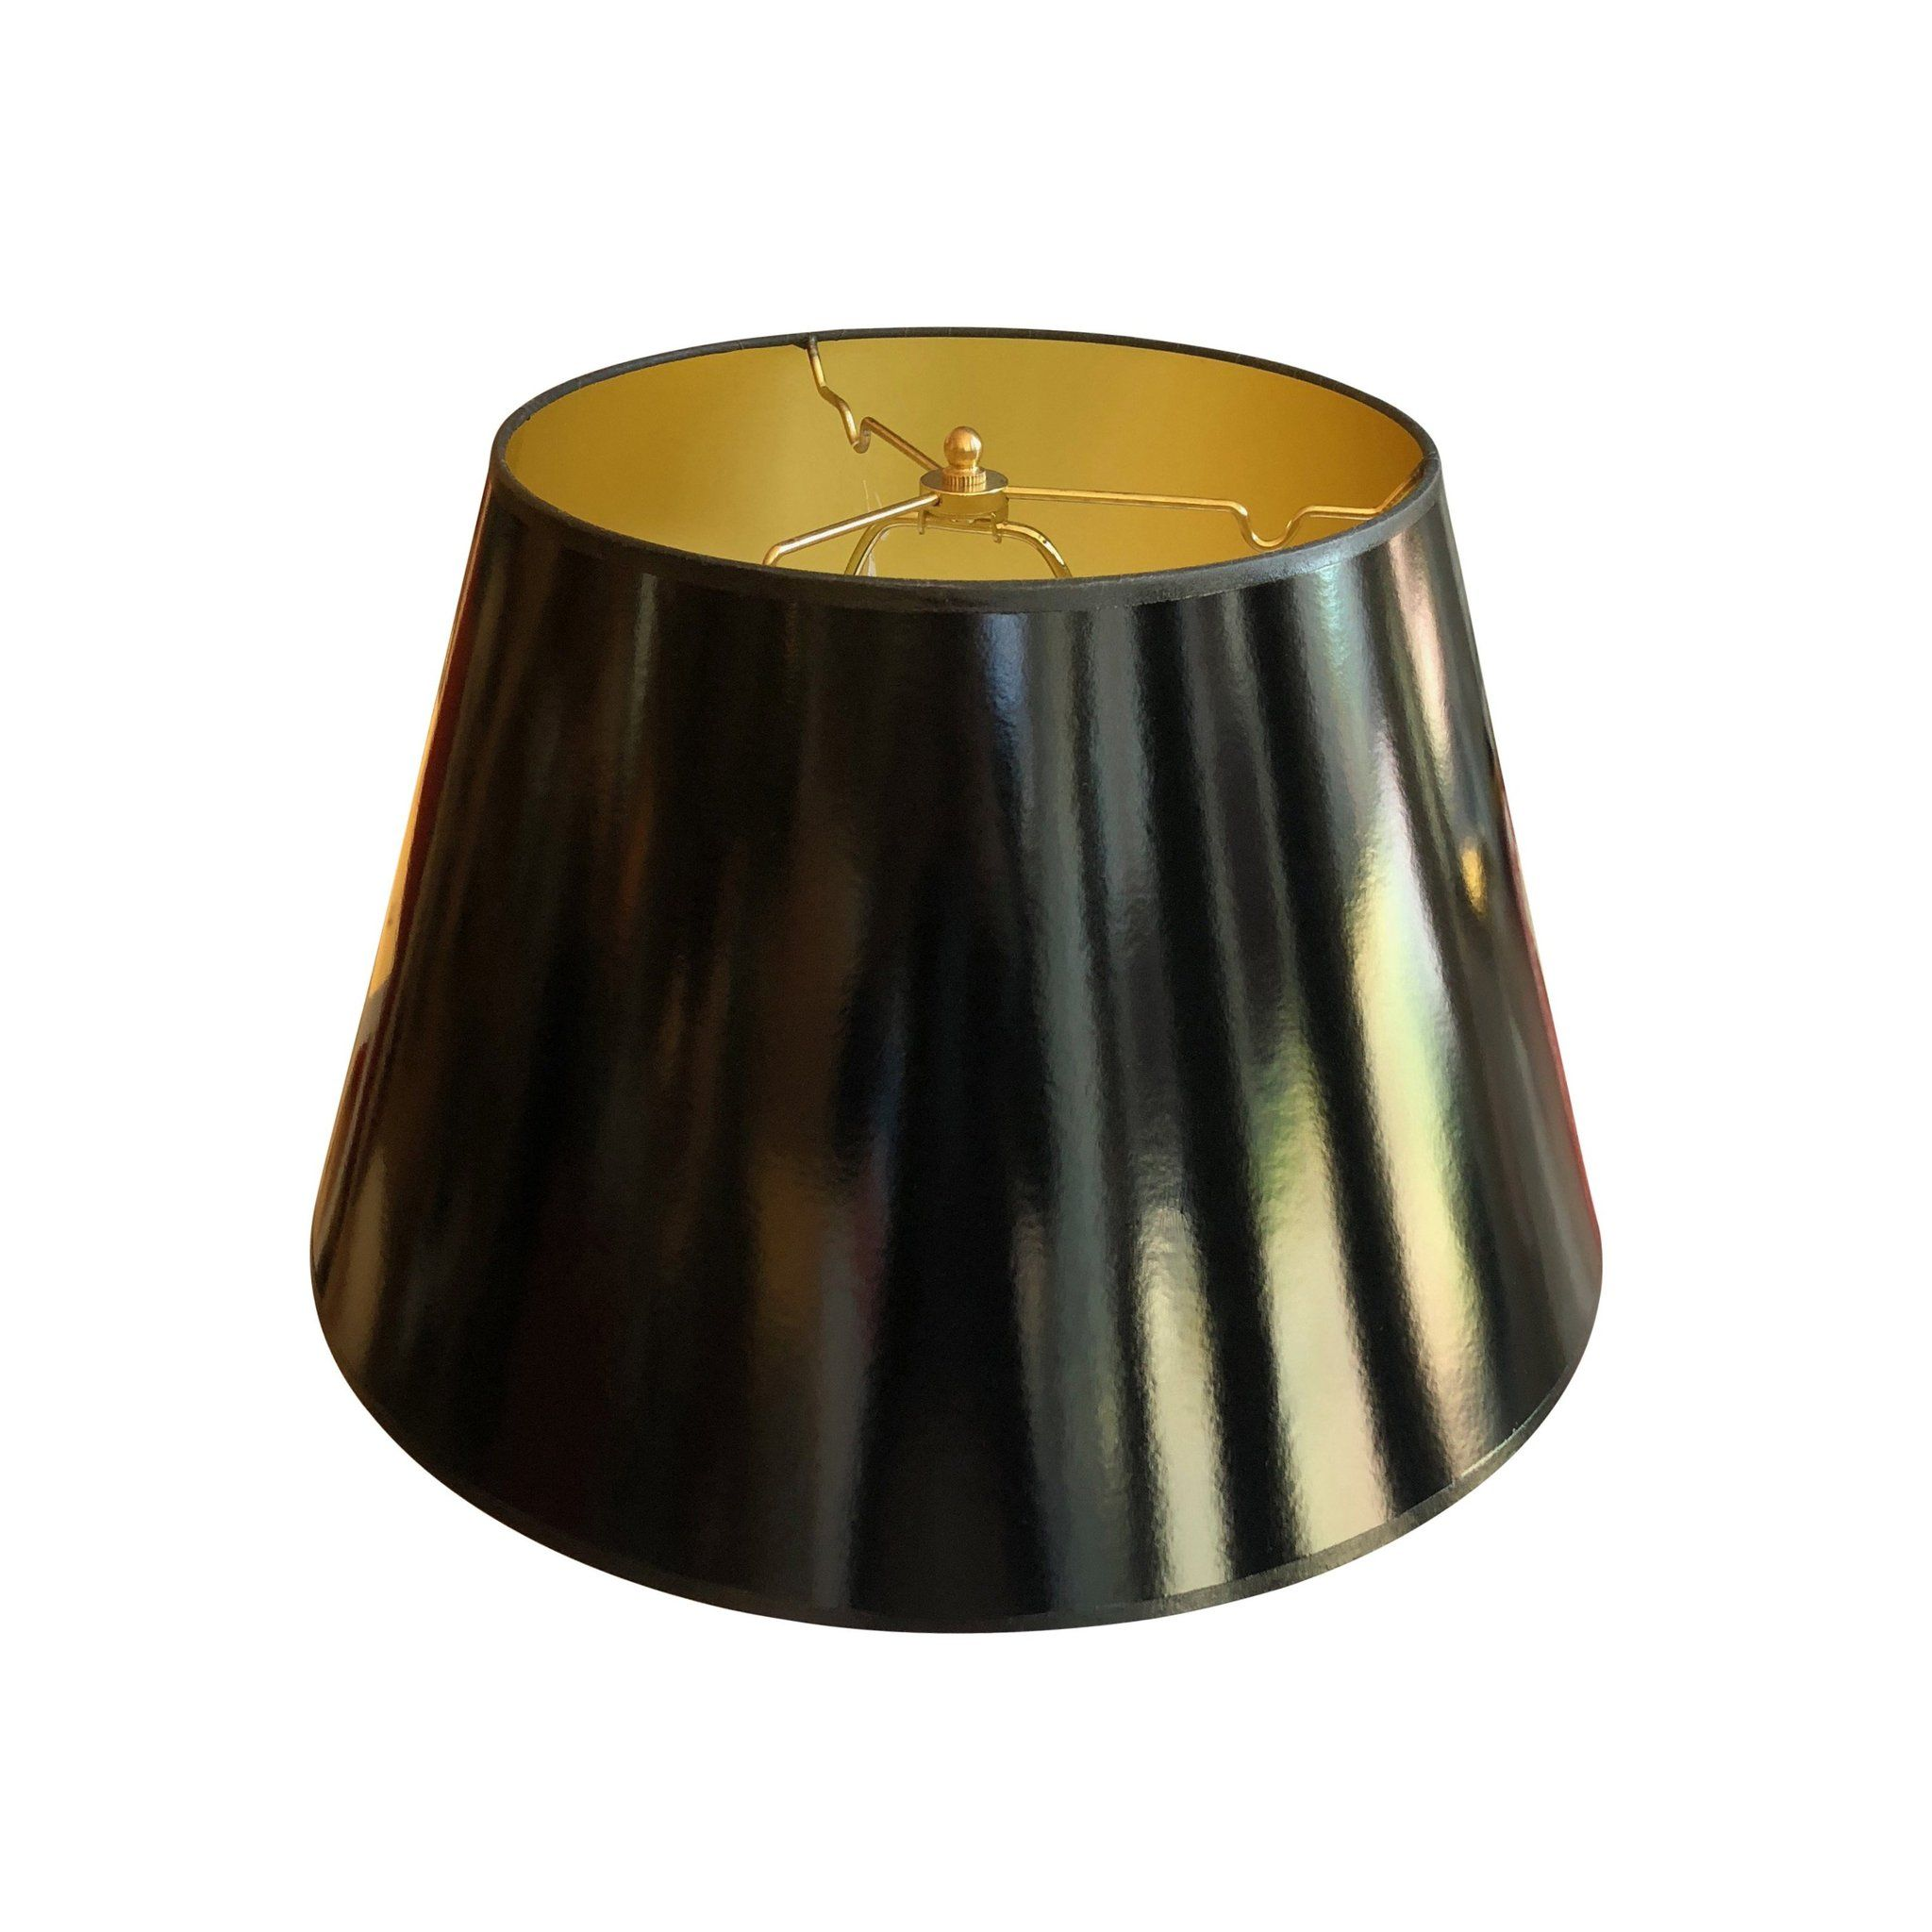 Black Lacquer Lampshades Ceiling Light Shades Lampshades Lamp Shade